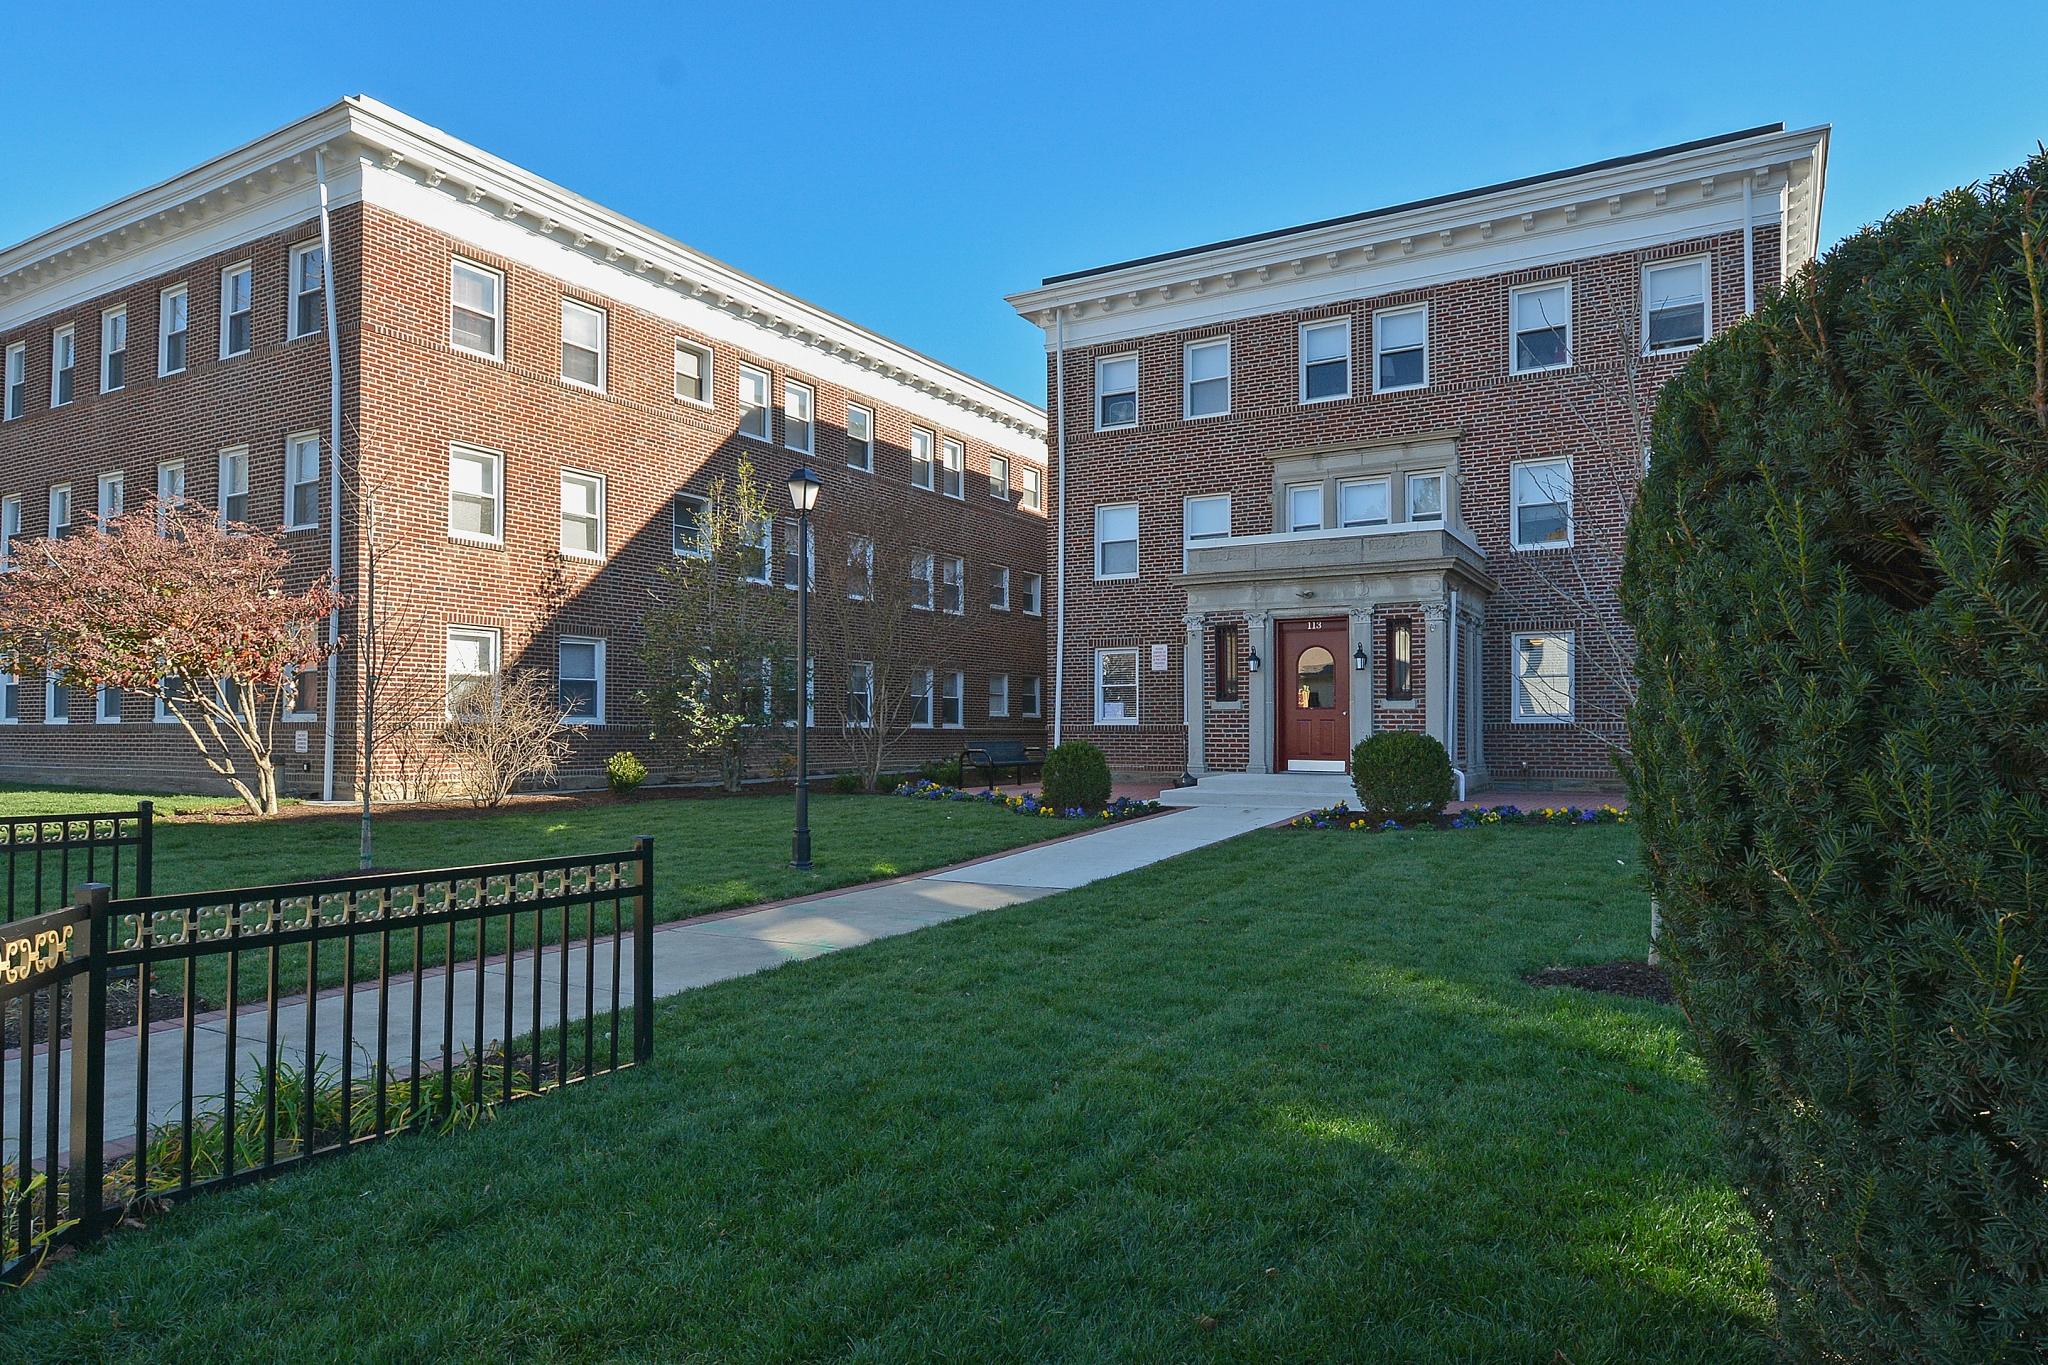 Suburban Court Apartments image 4